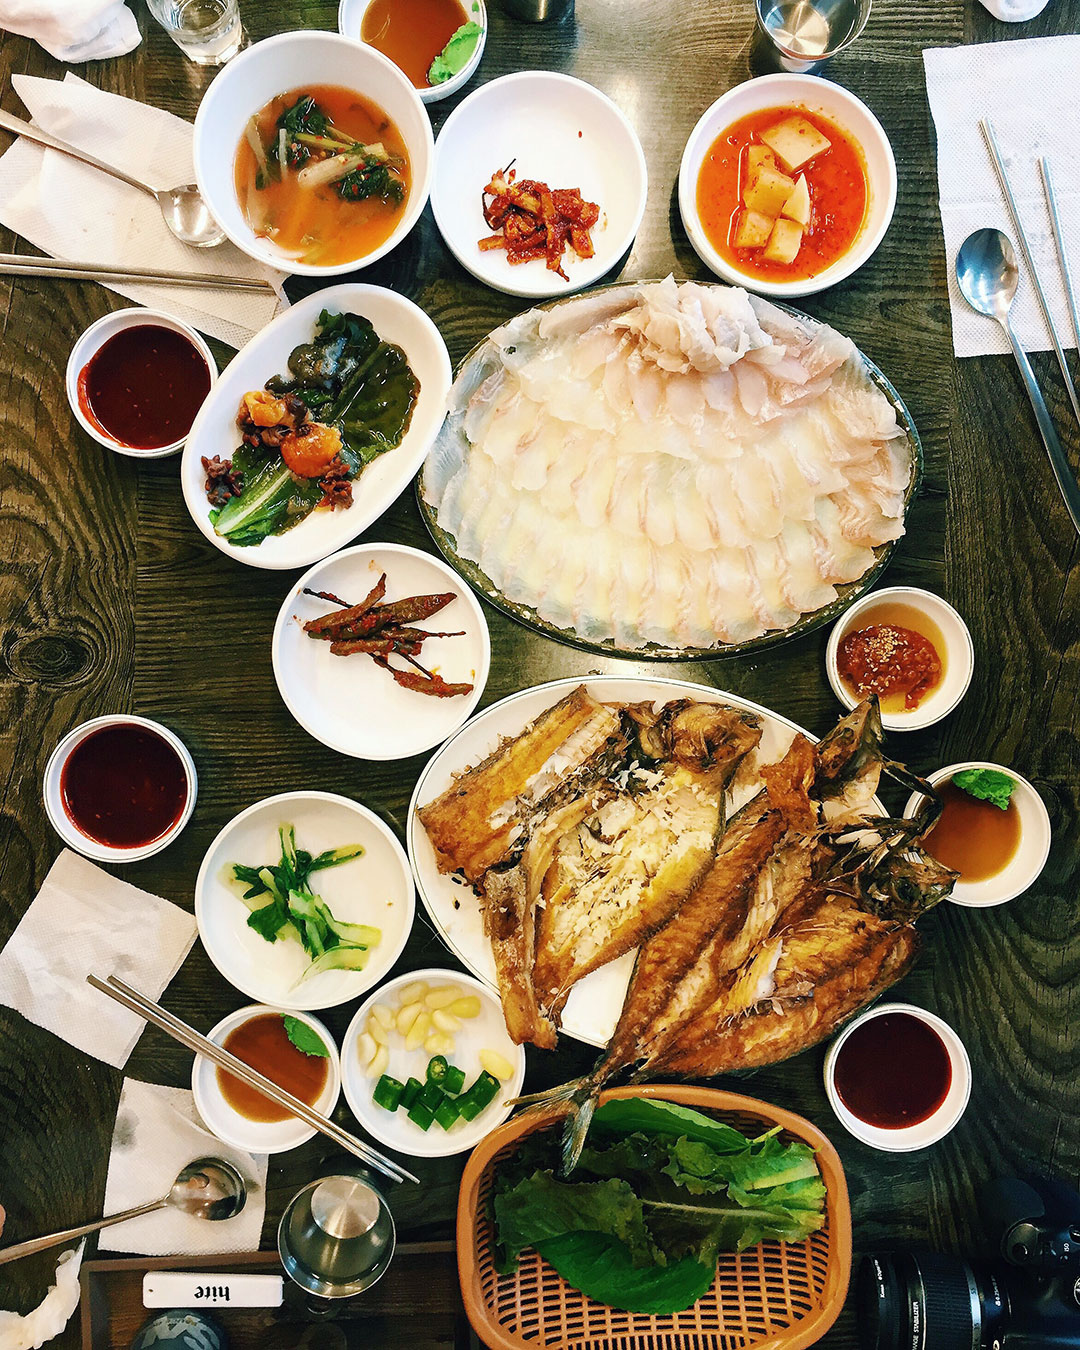 Korean style sashimi, fried fish, and banchan from the Jagalchi Fish Market.